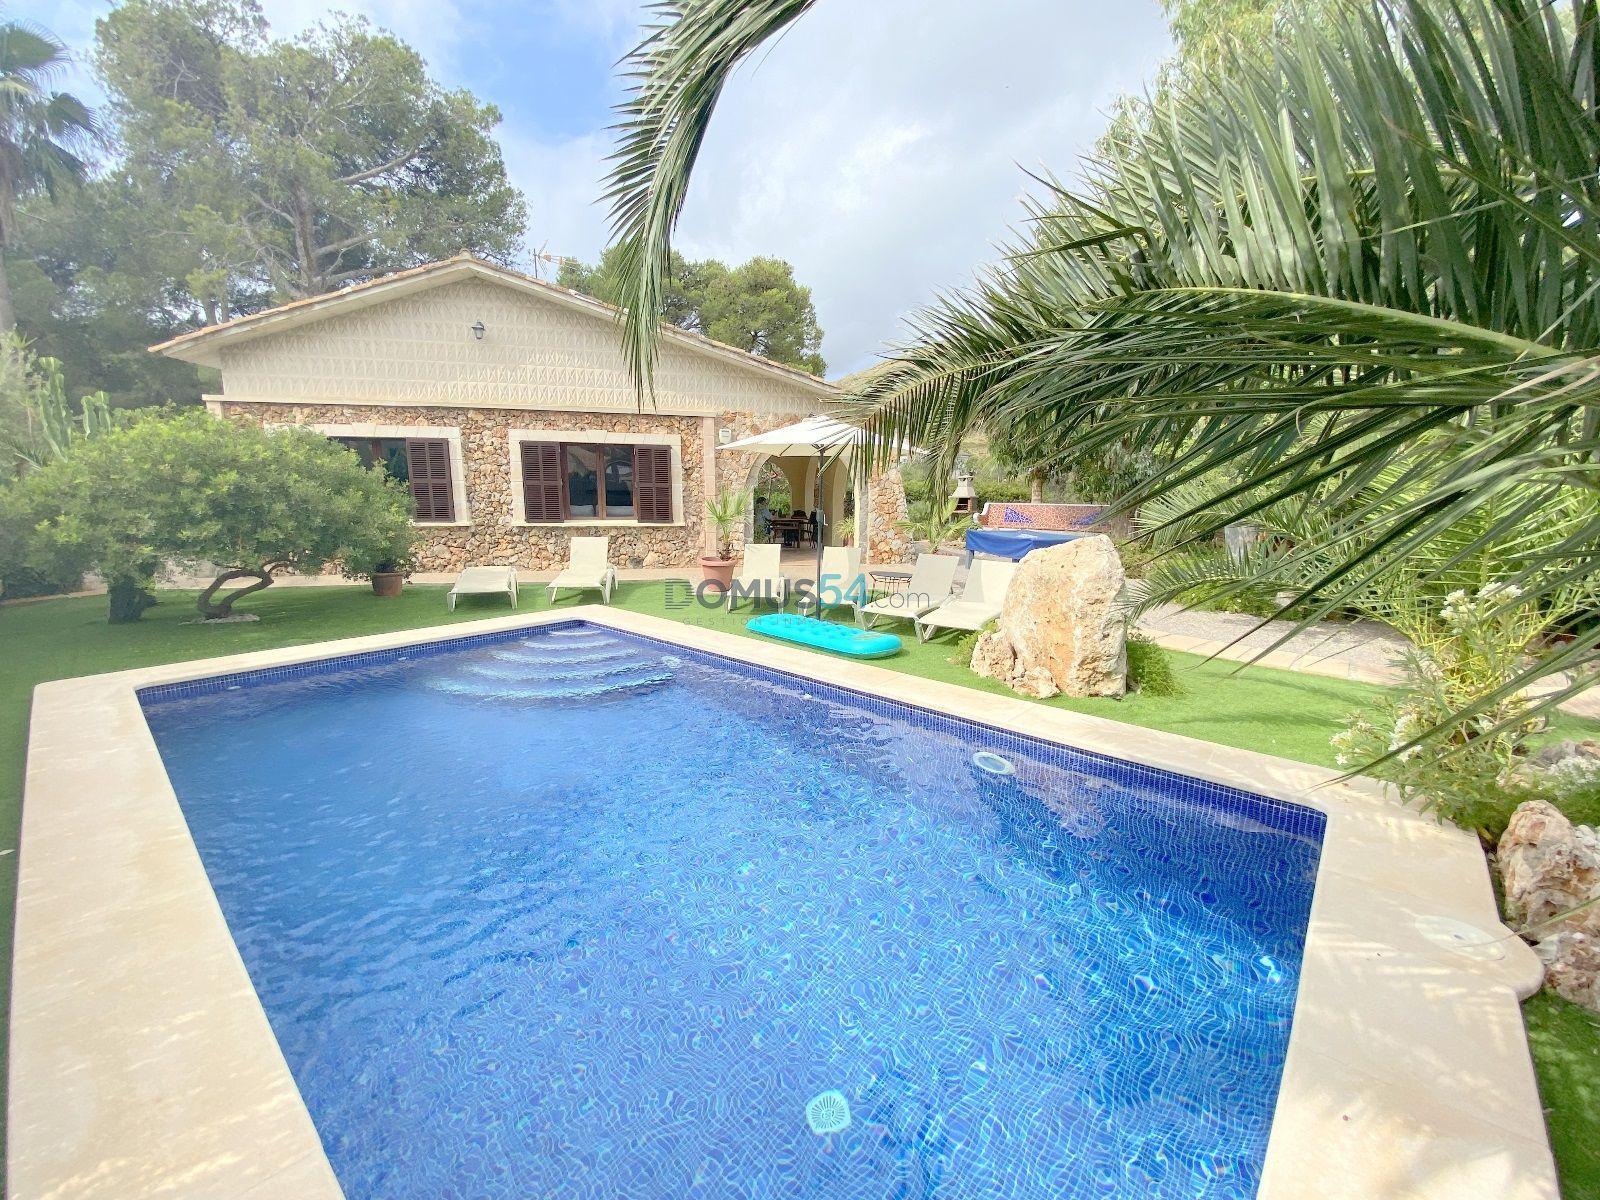 Chalet unifamiliar con piscina